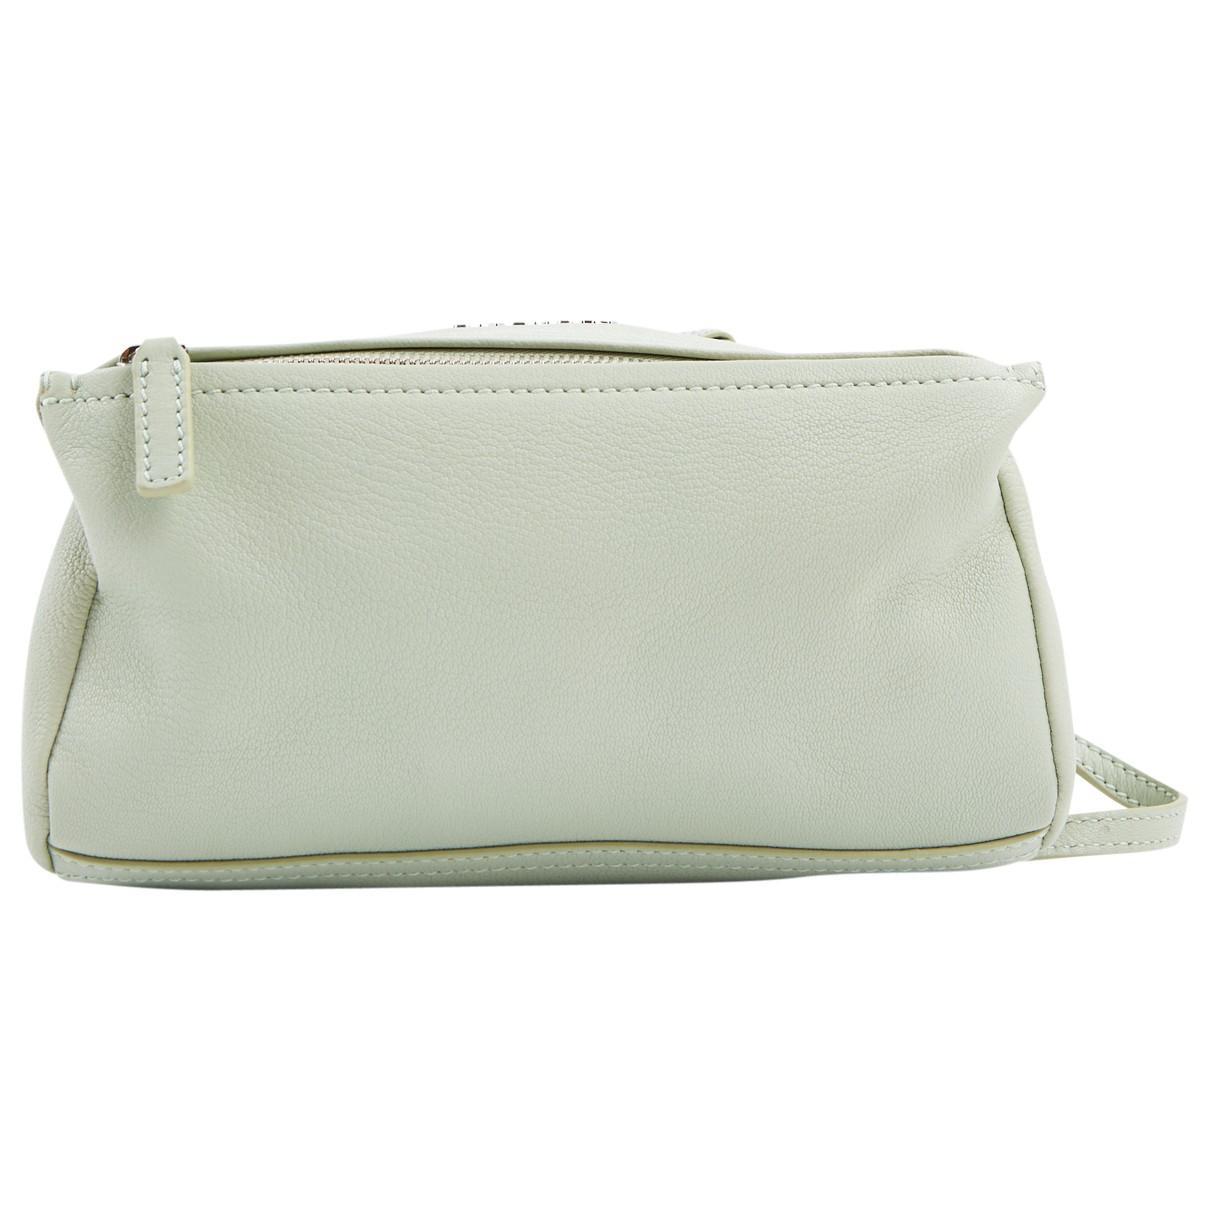 66b836df14 Givenchy Pandora Box Green Leather Handbag in Green - Lyst